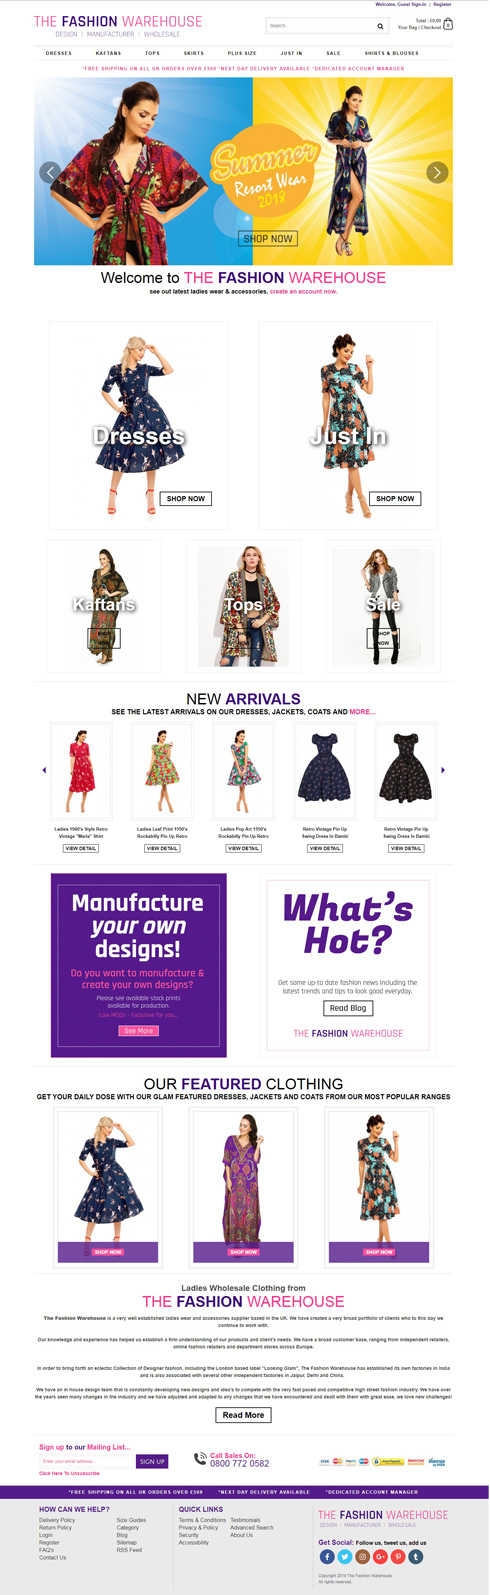 The Fashion Warehouse United Kingdom Web Design